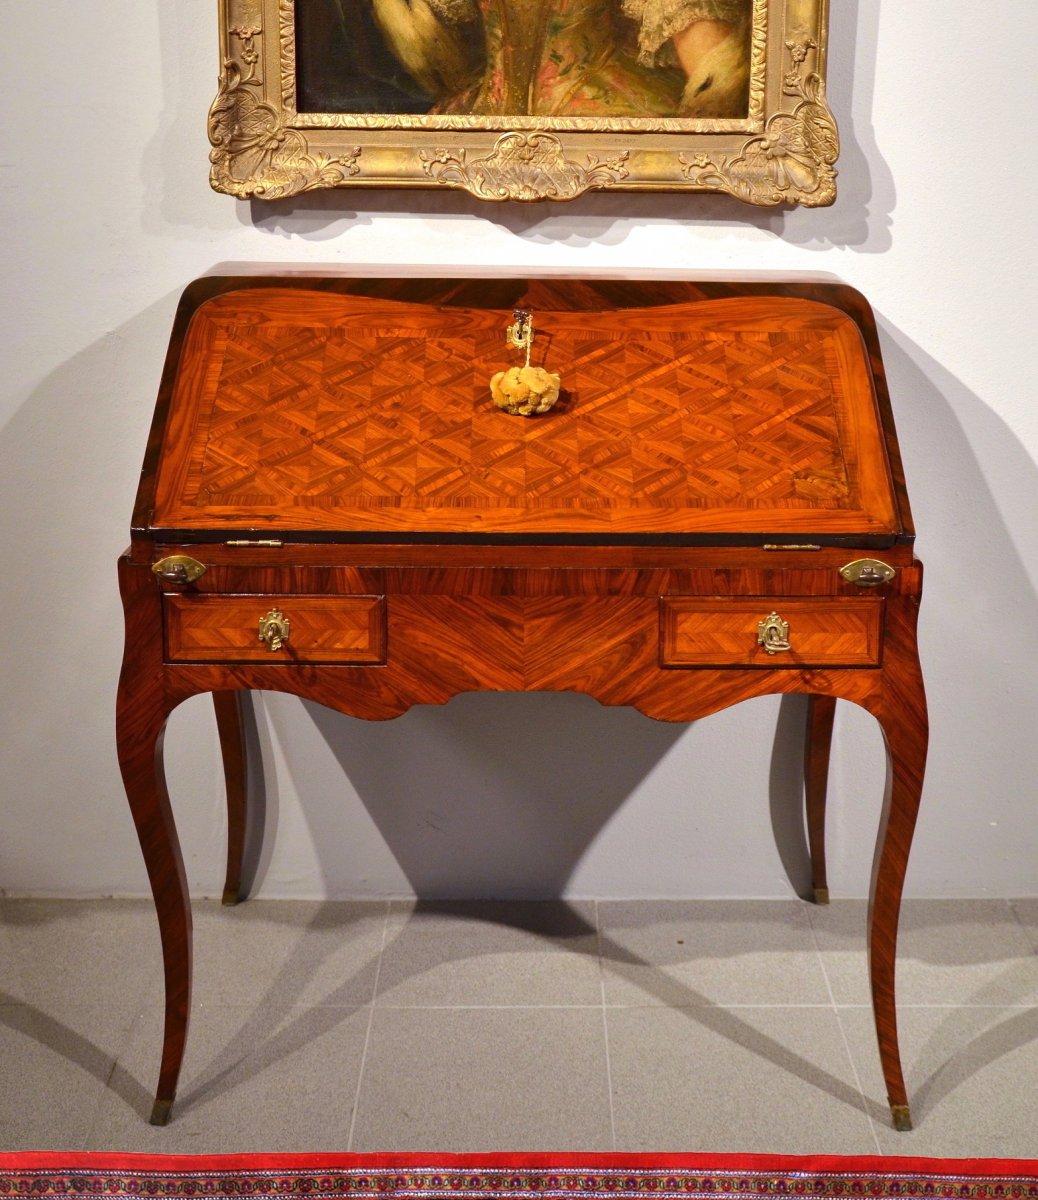 Bureau De Pente Louis XV, Paris Vers 1750, Atelier Pierre II Migeon (Paris 1696-1758)